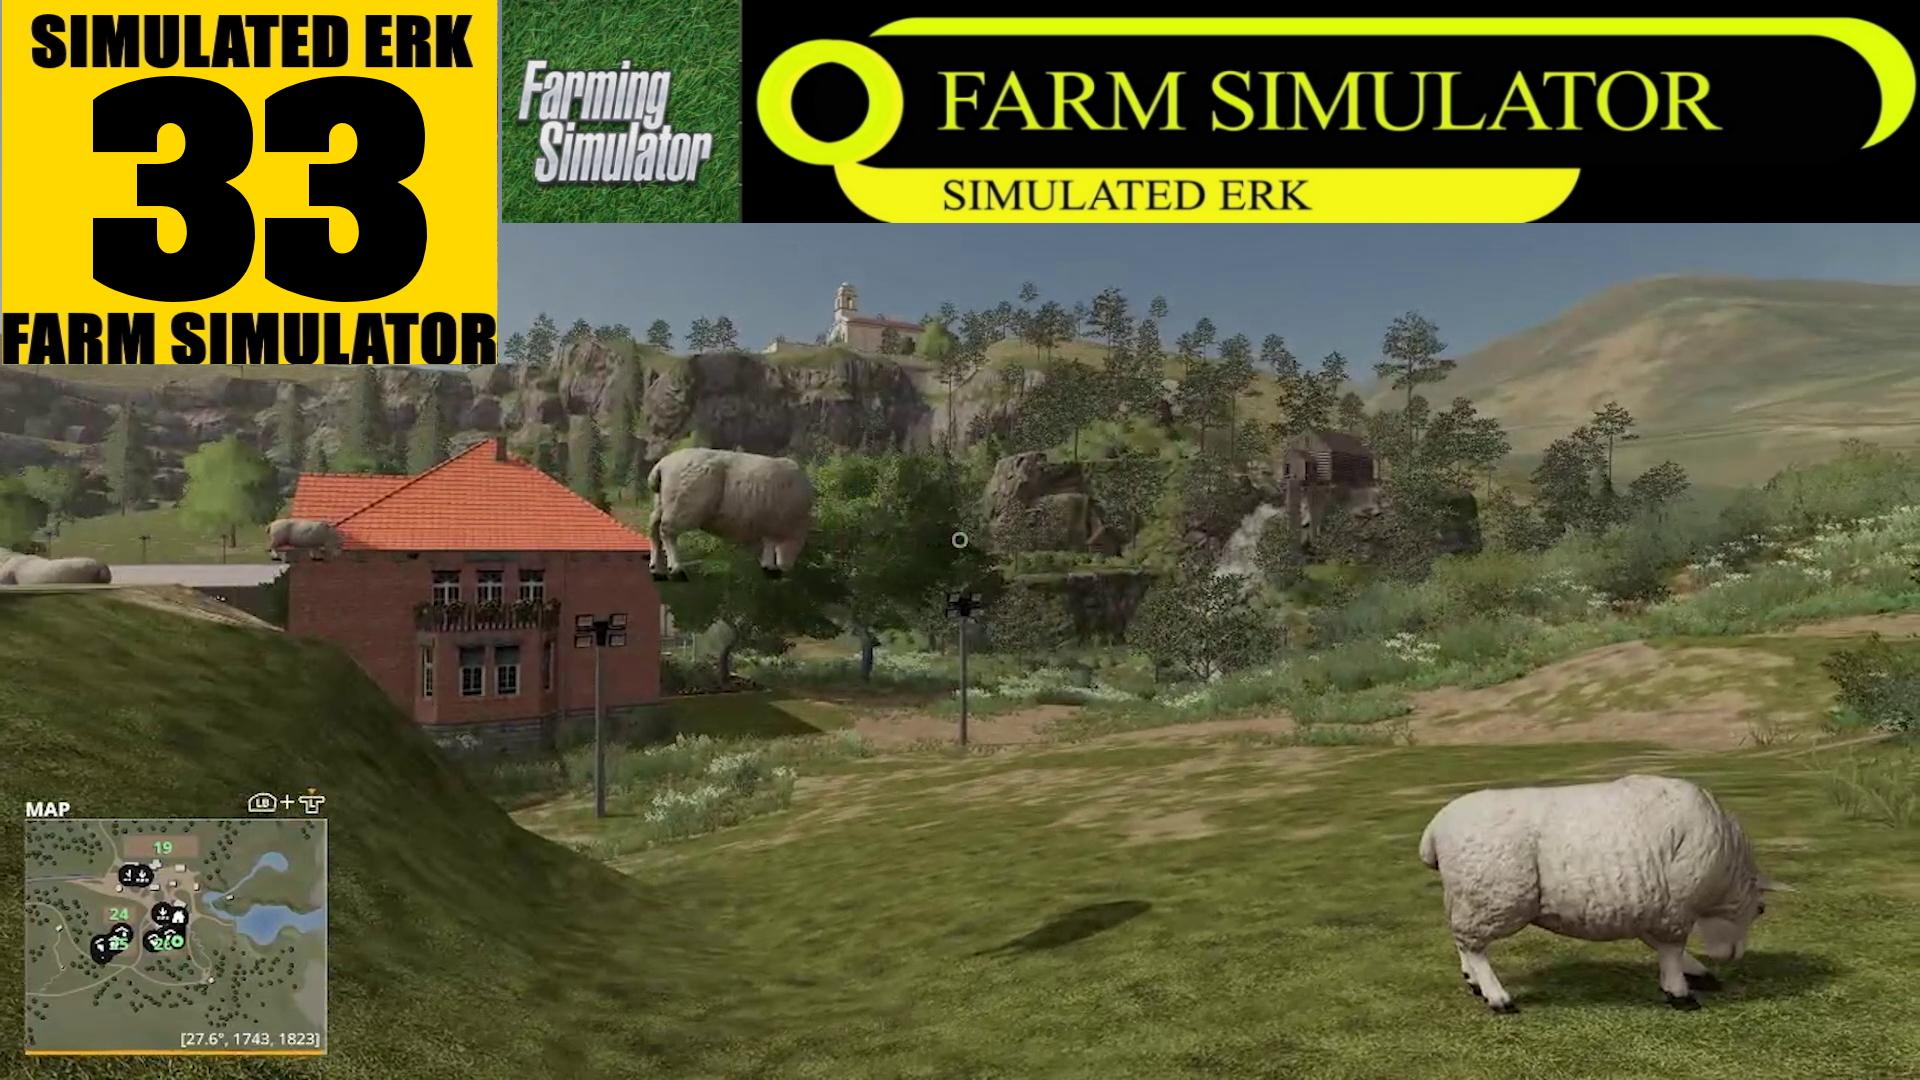 Simulated Erk: Farm Simulator episode 33   This Isn't Landscape Simulator!